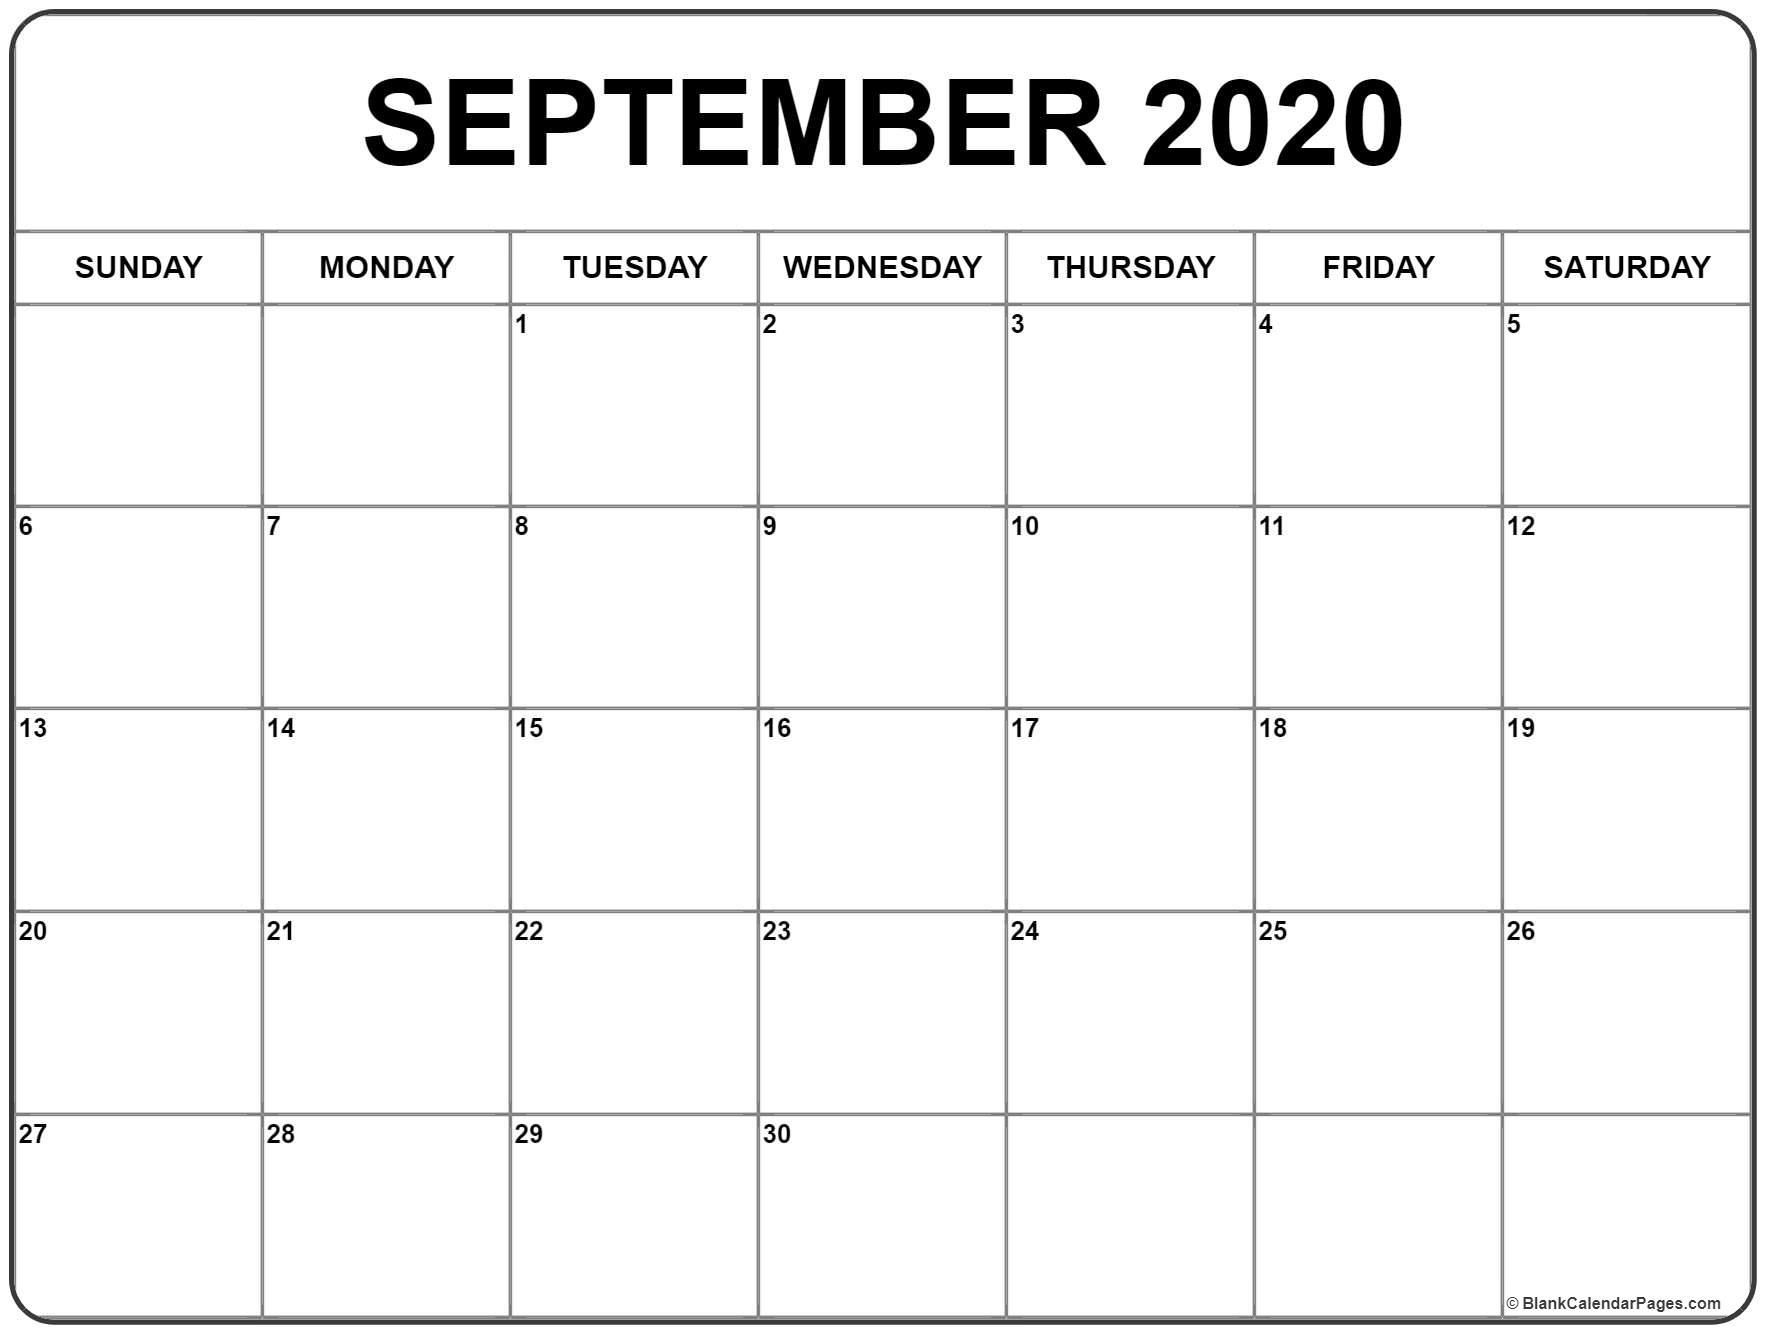 September 2020 Calendar | Free Printable Monthly Calendars_Blank Calendar Template September 2020